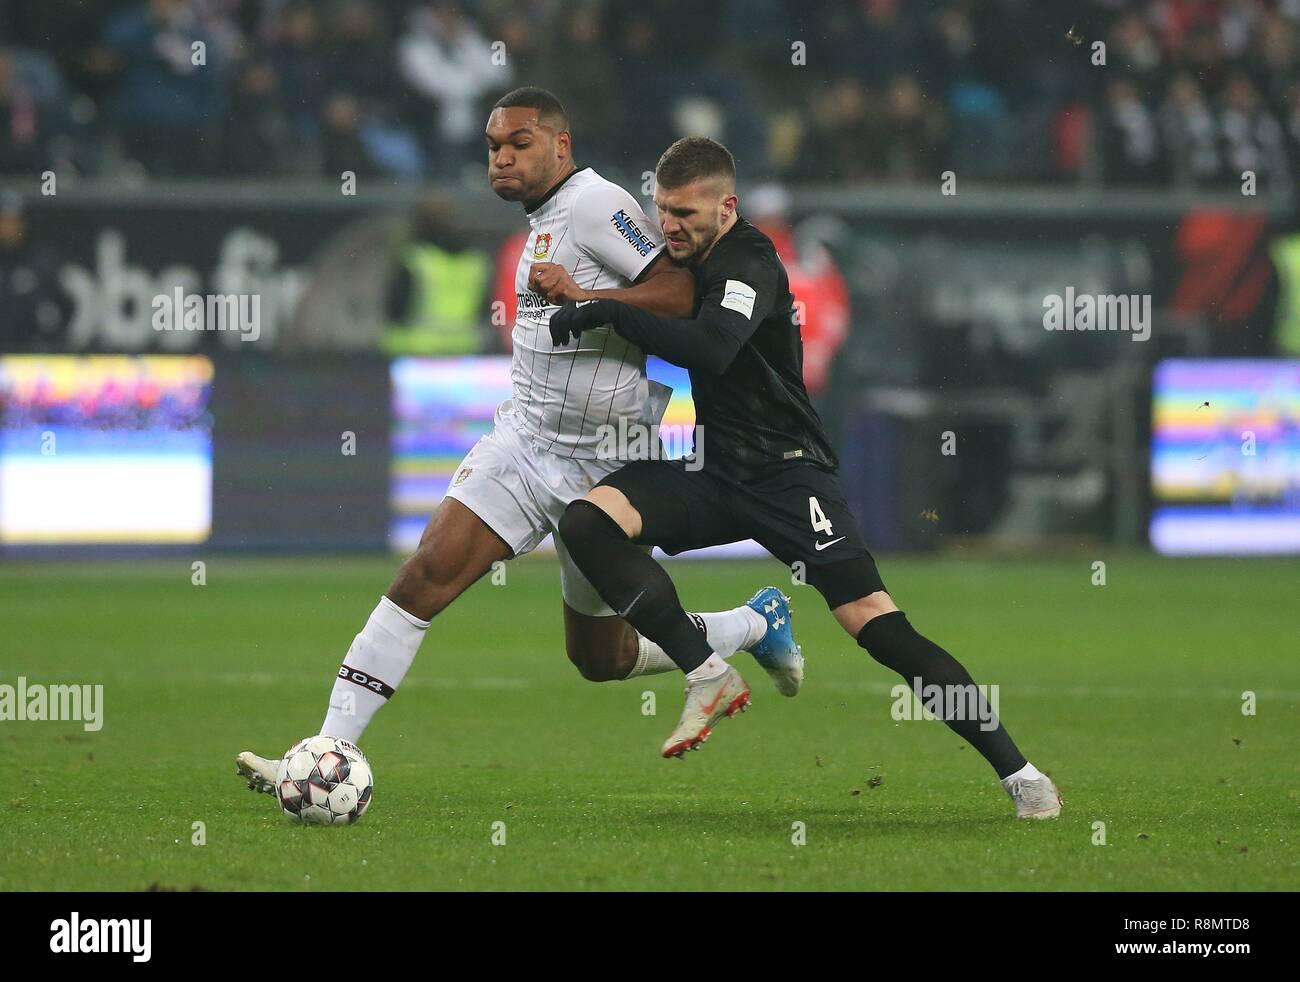 firo: 16.12.2018, football, 1.Bundesliga, season 2018/2019, Eintracht Frankfurt - Bayer 04 Leverkusen TAH versus REBIC   usage worldwide - Stock Image